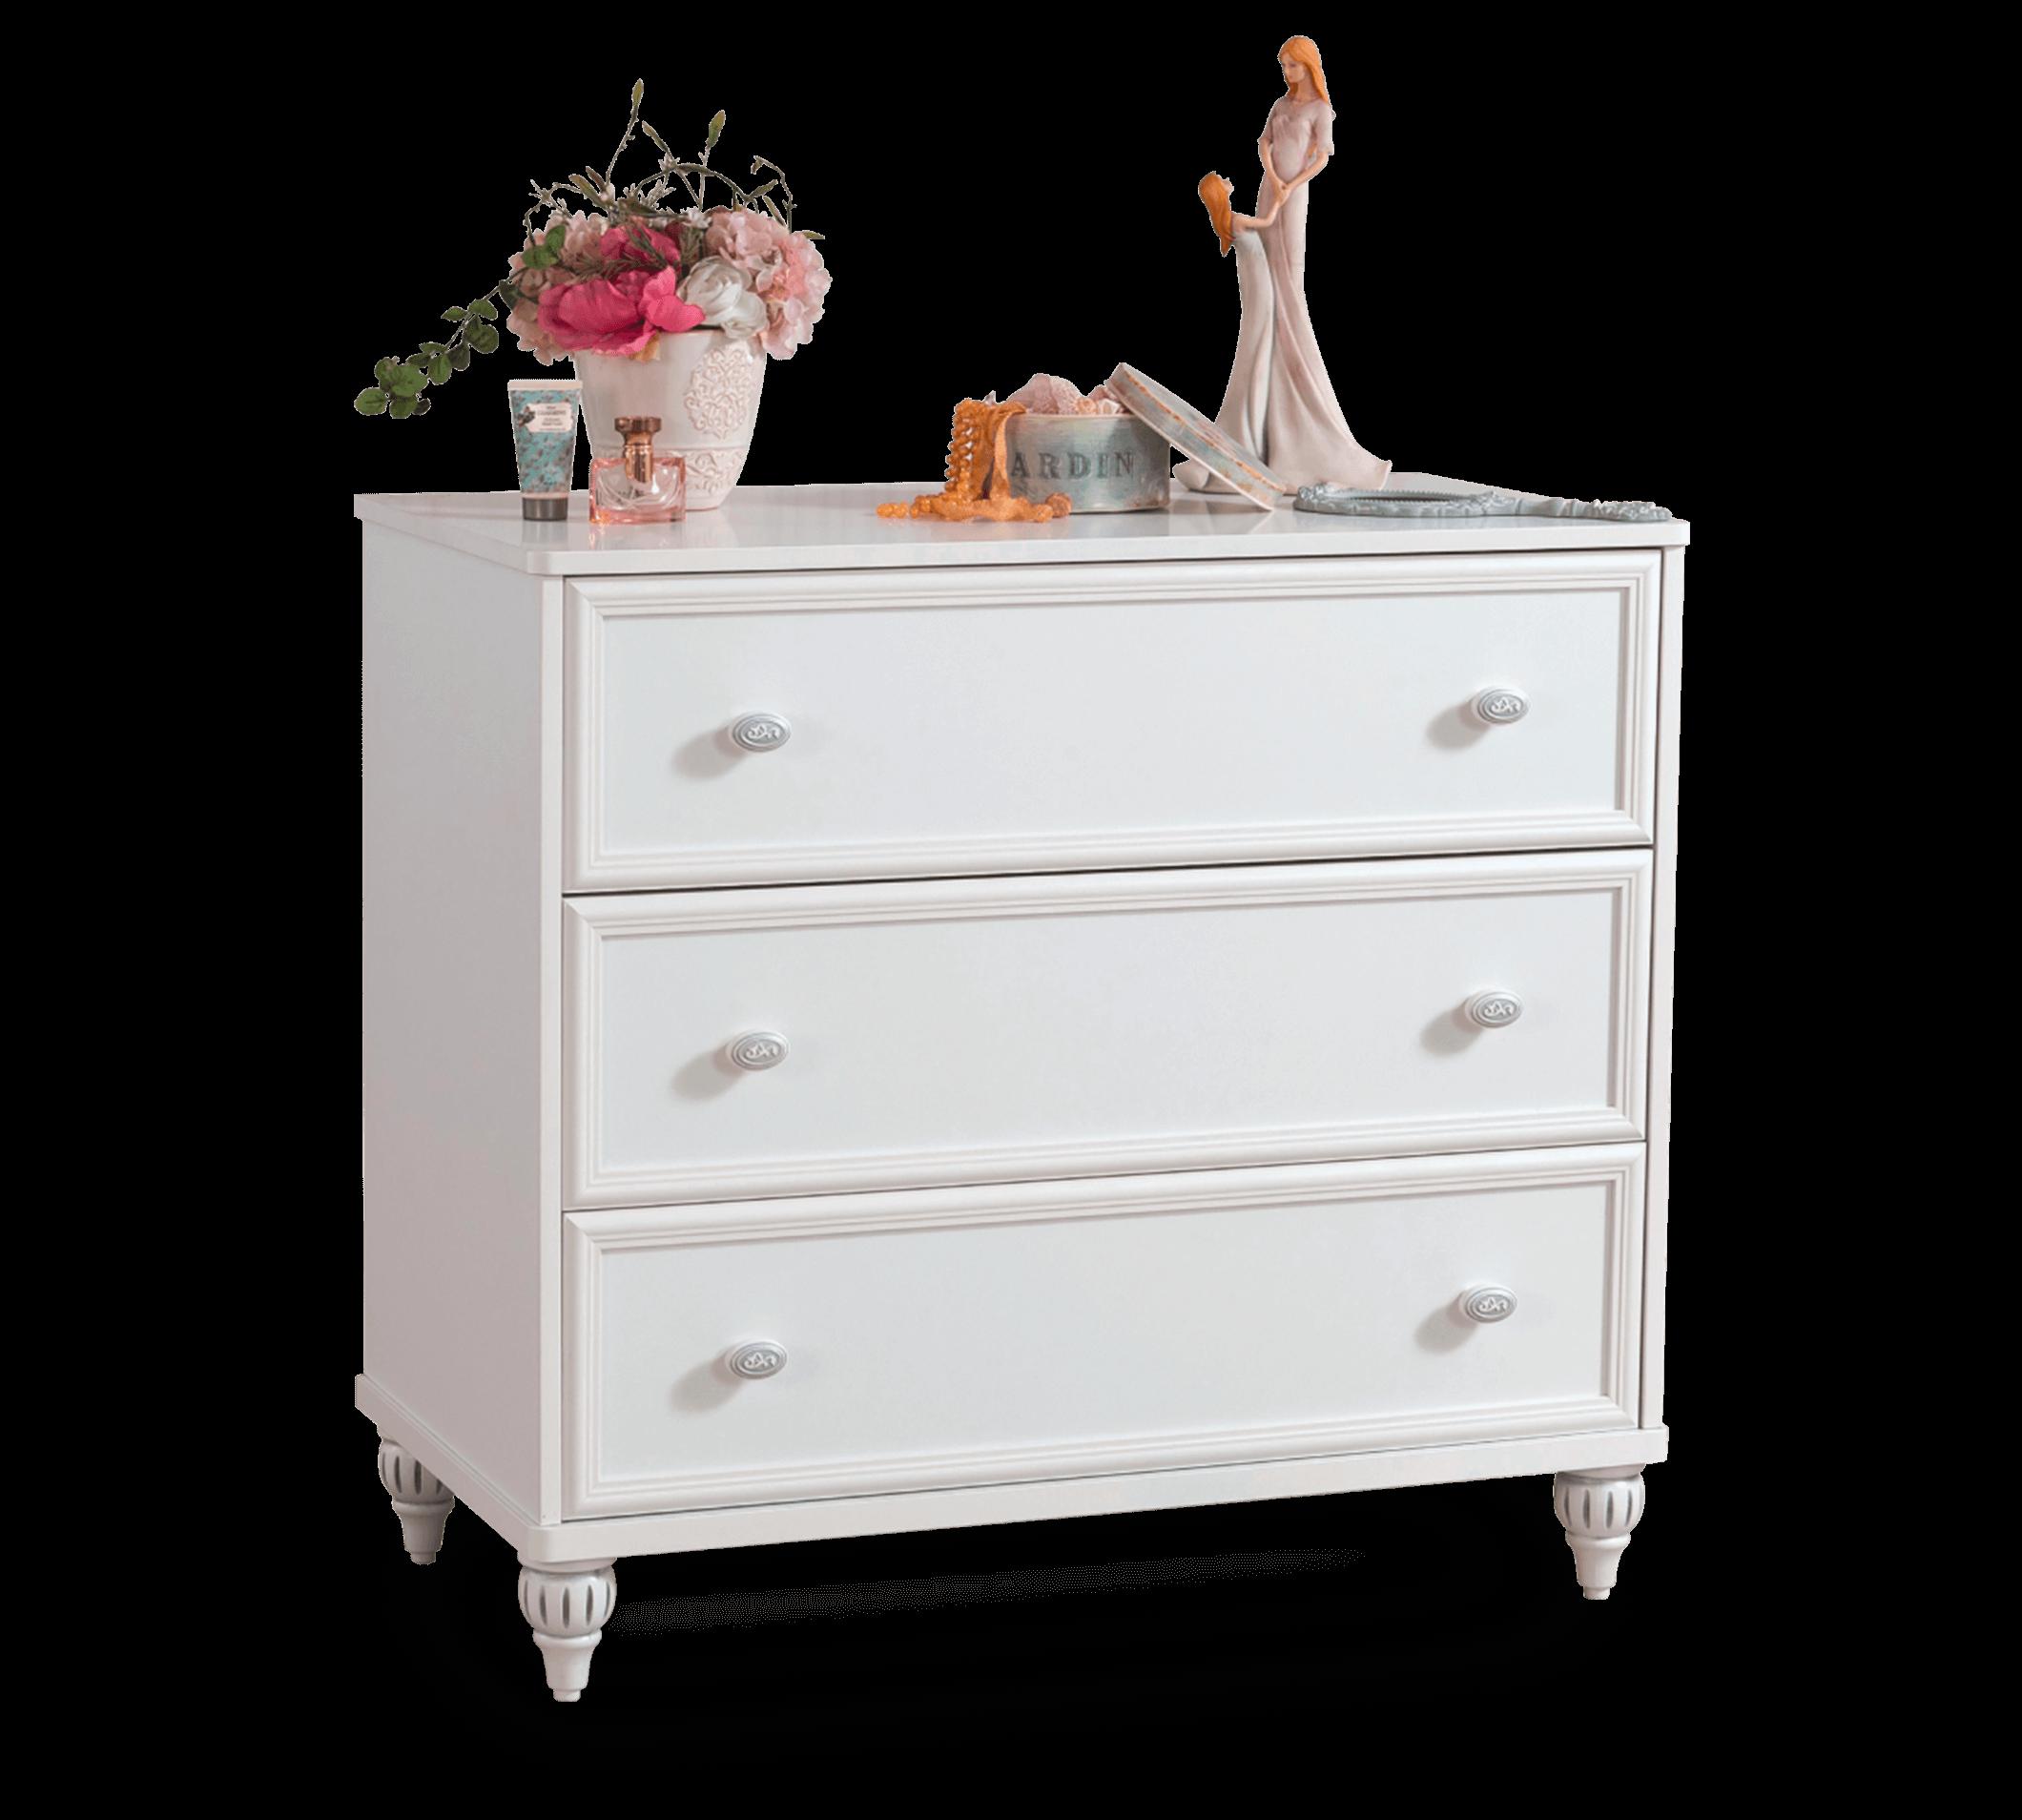 Comoda din pal cu 3 sertare, pentru copii si tineret Romantica White, l90xA50xH84 cm poza